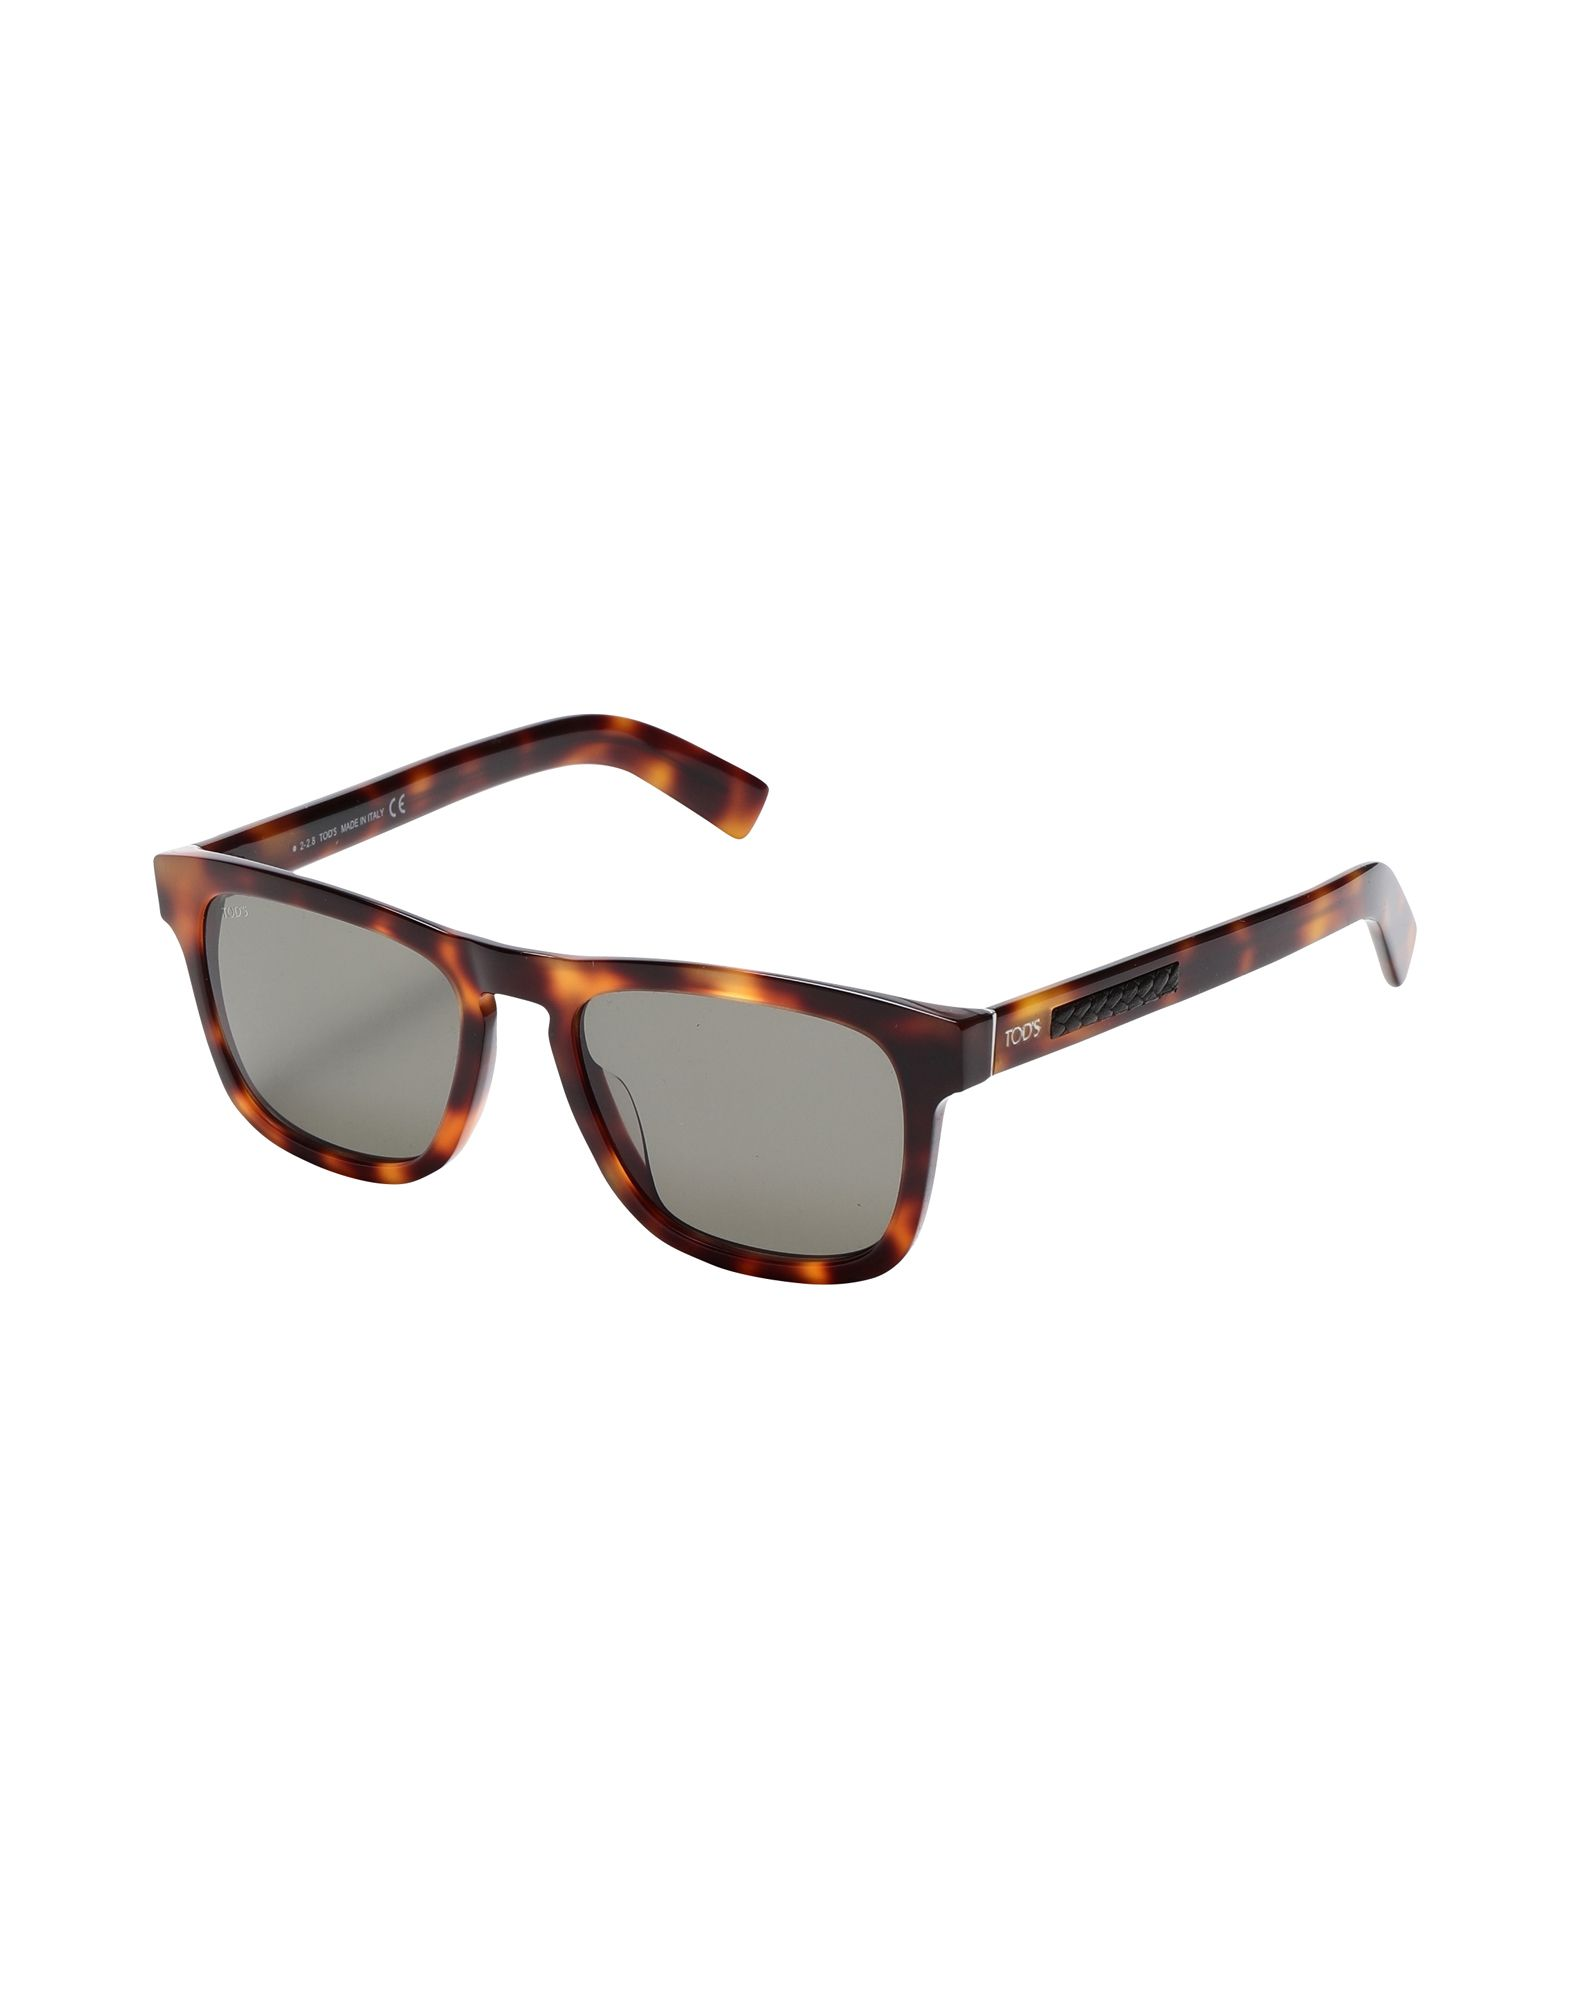 Фото - TOD'S Солнечные очки 3d очки